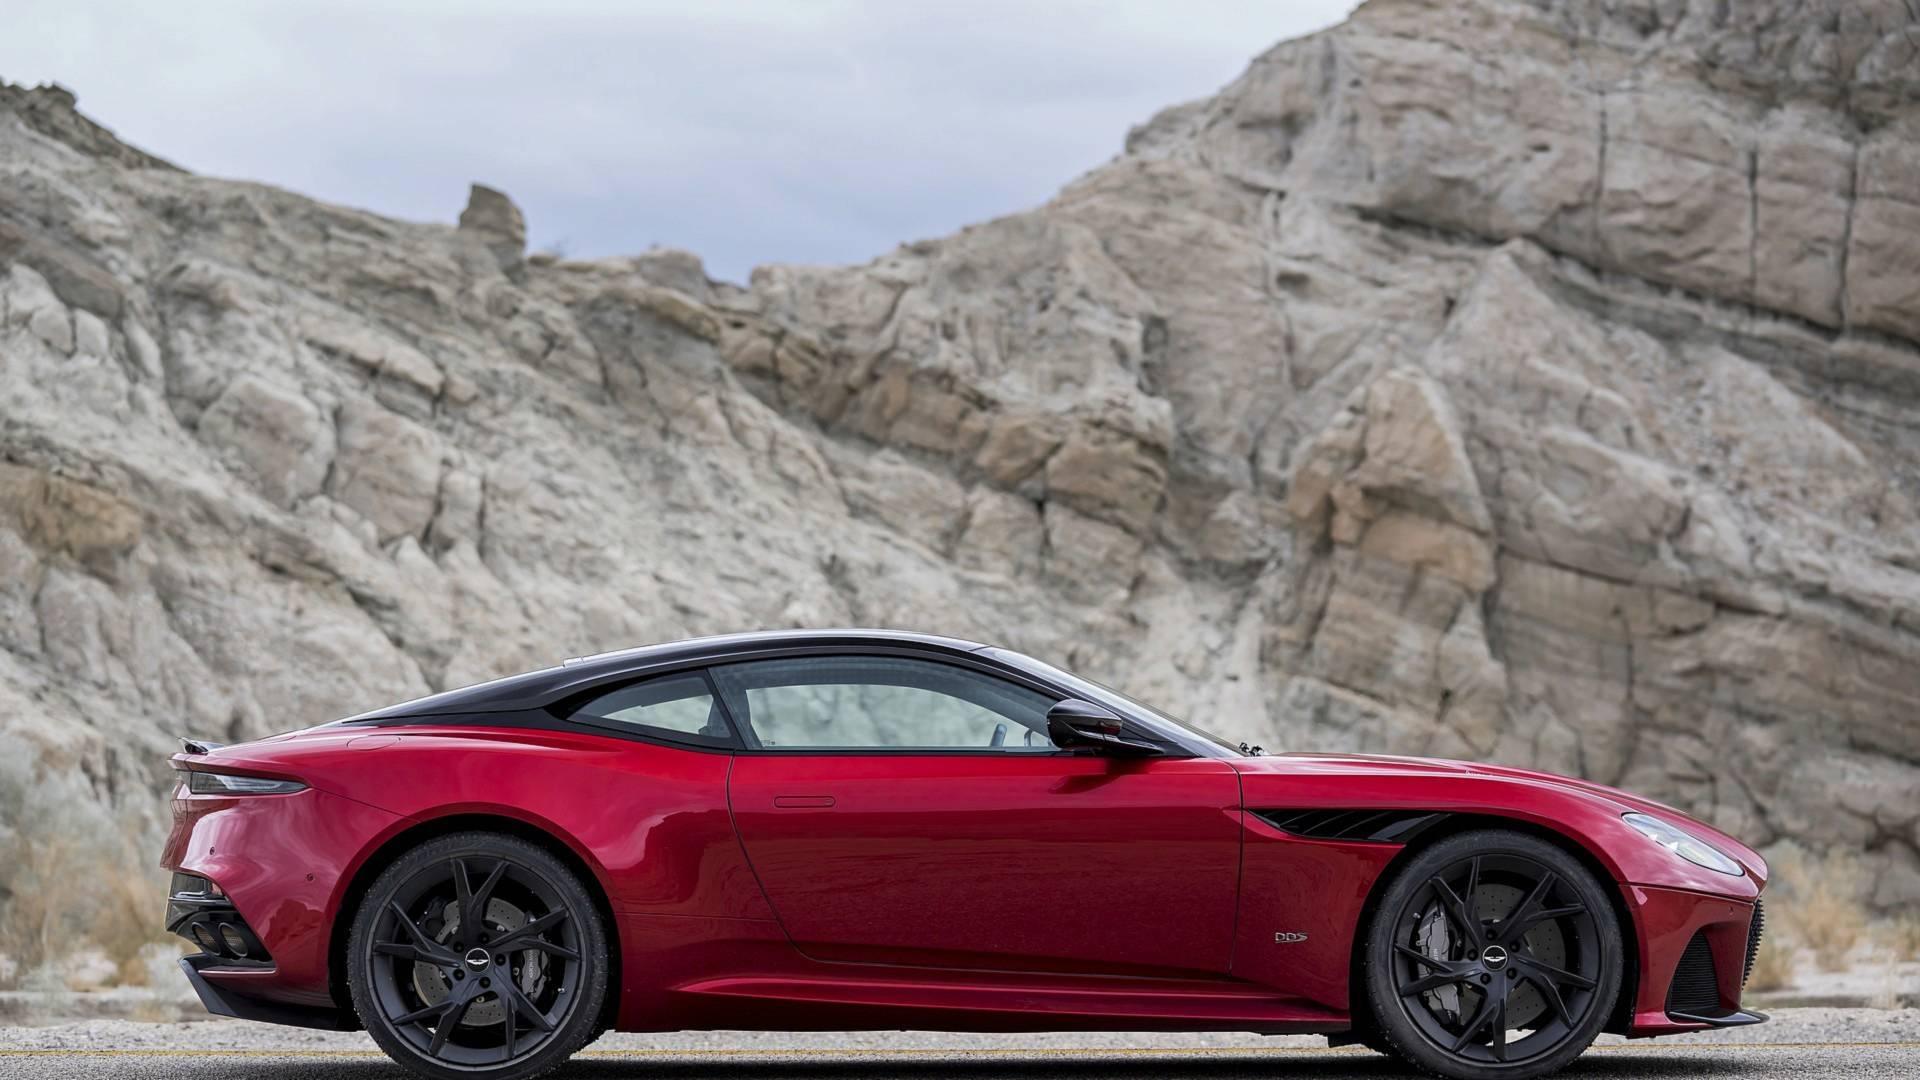 Aston Martin Joins The Super Gt Club With The New Dbs Superleggera